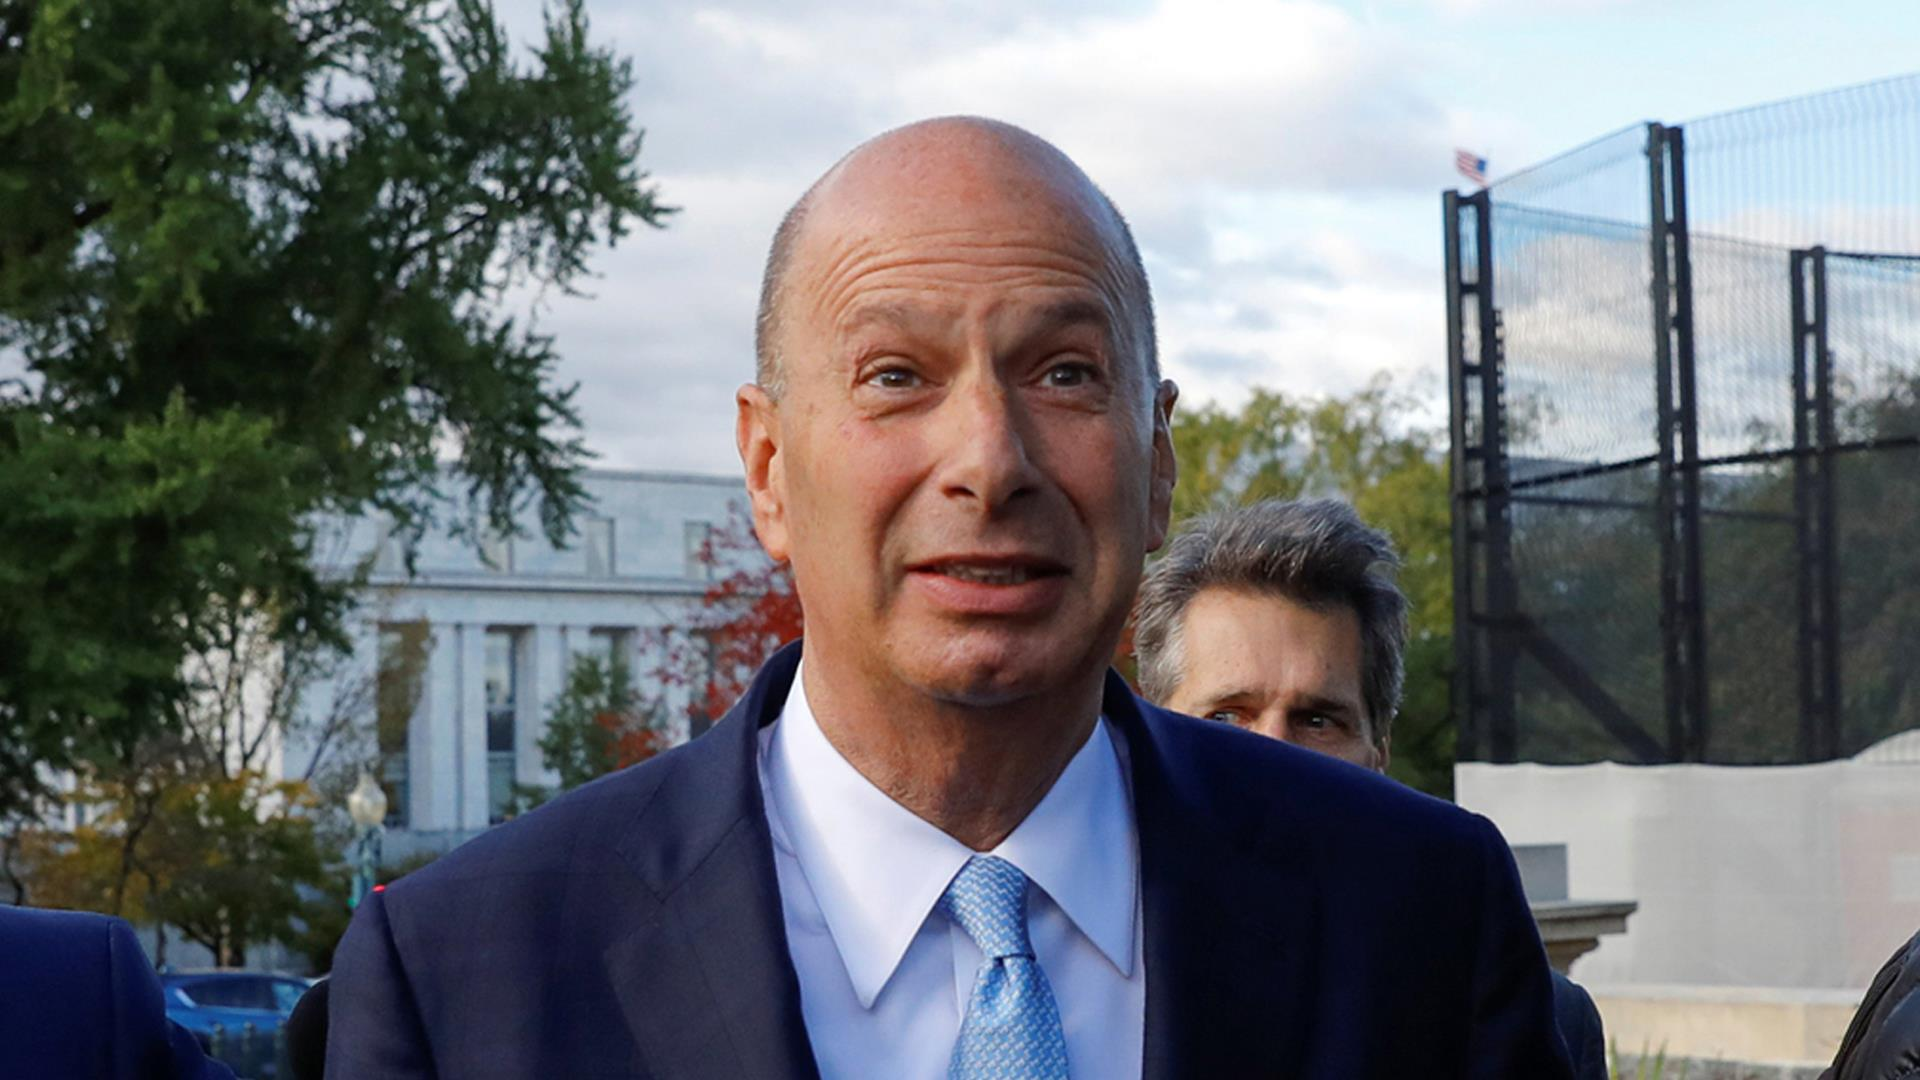 Sondland to testify that Trump directed Giuliani to push Ukraine scheme